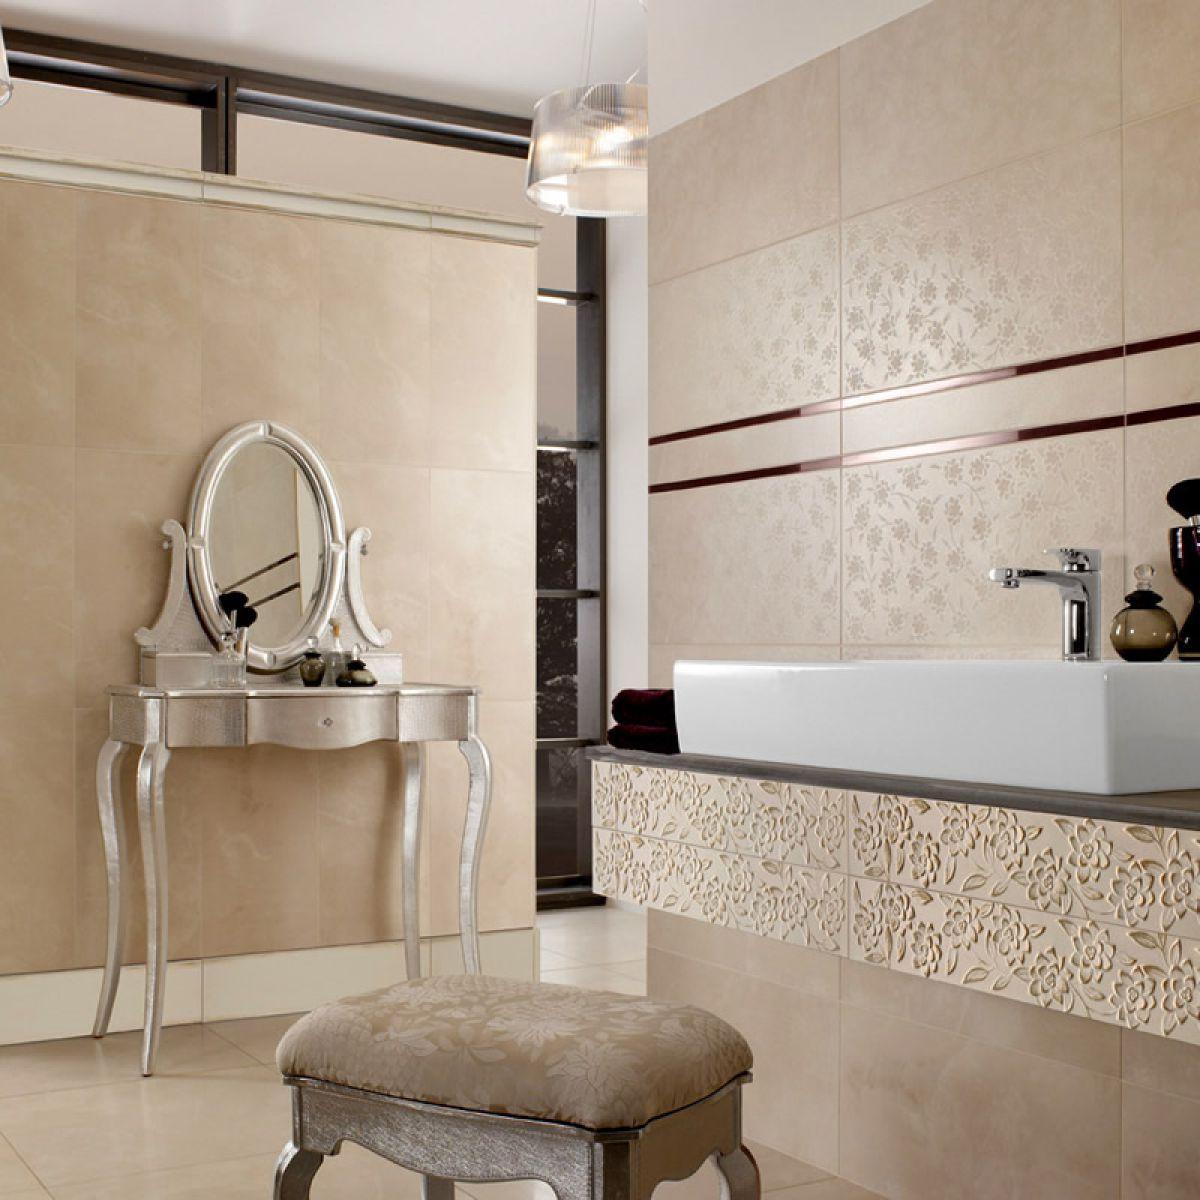 Bathroom Tiles Villeroy Boch perfect bathroom tiles villeroy boch tile in colors series